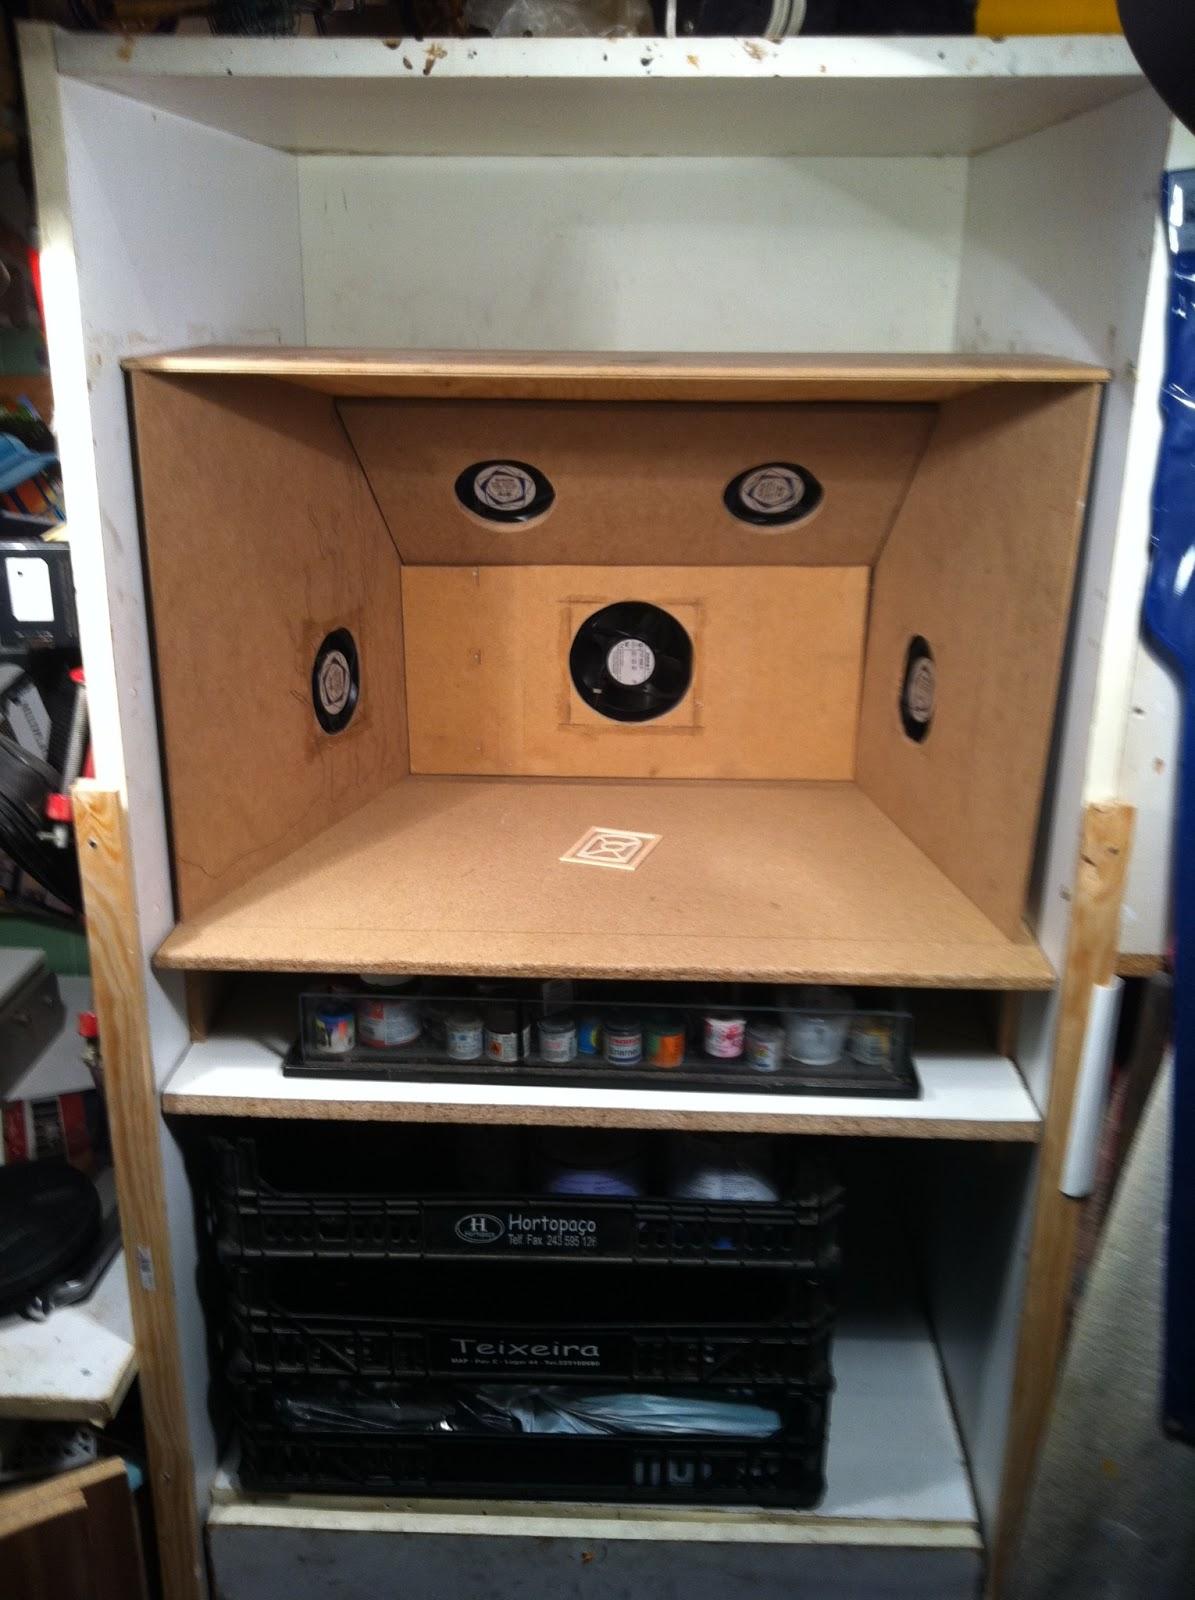 Ttriganices cabine de pintura do triganices - Estufa para habitacion pequena ...